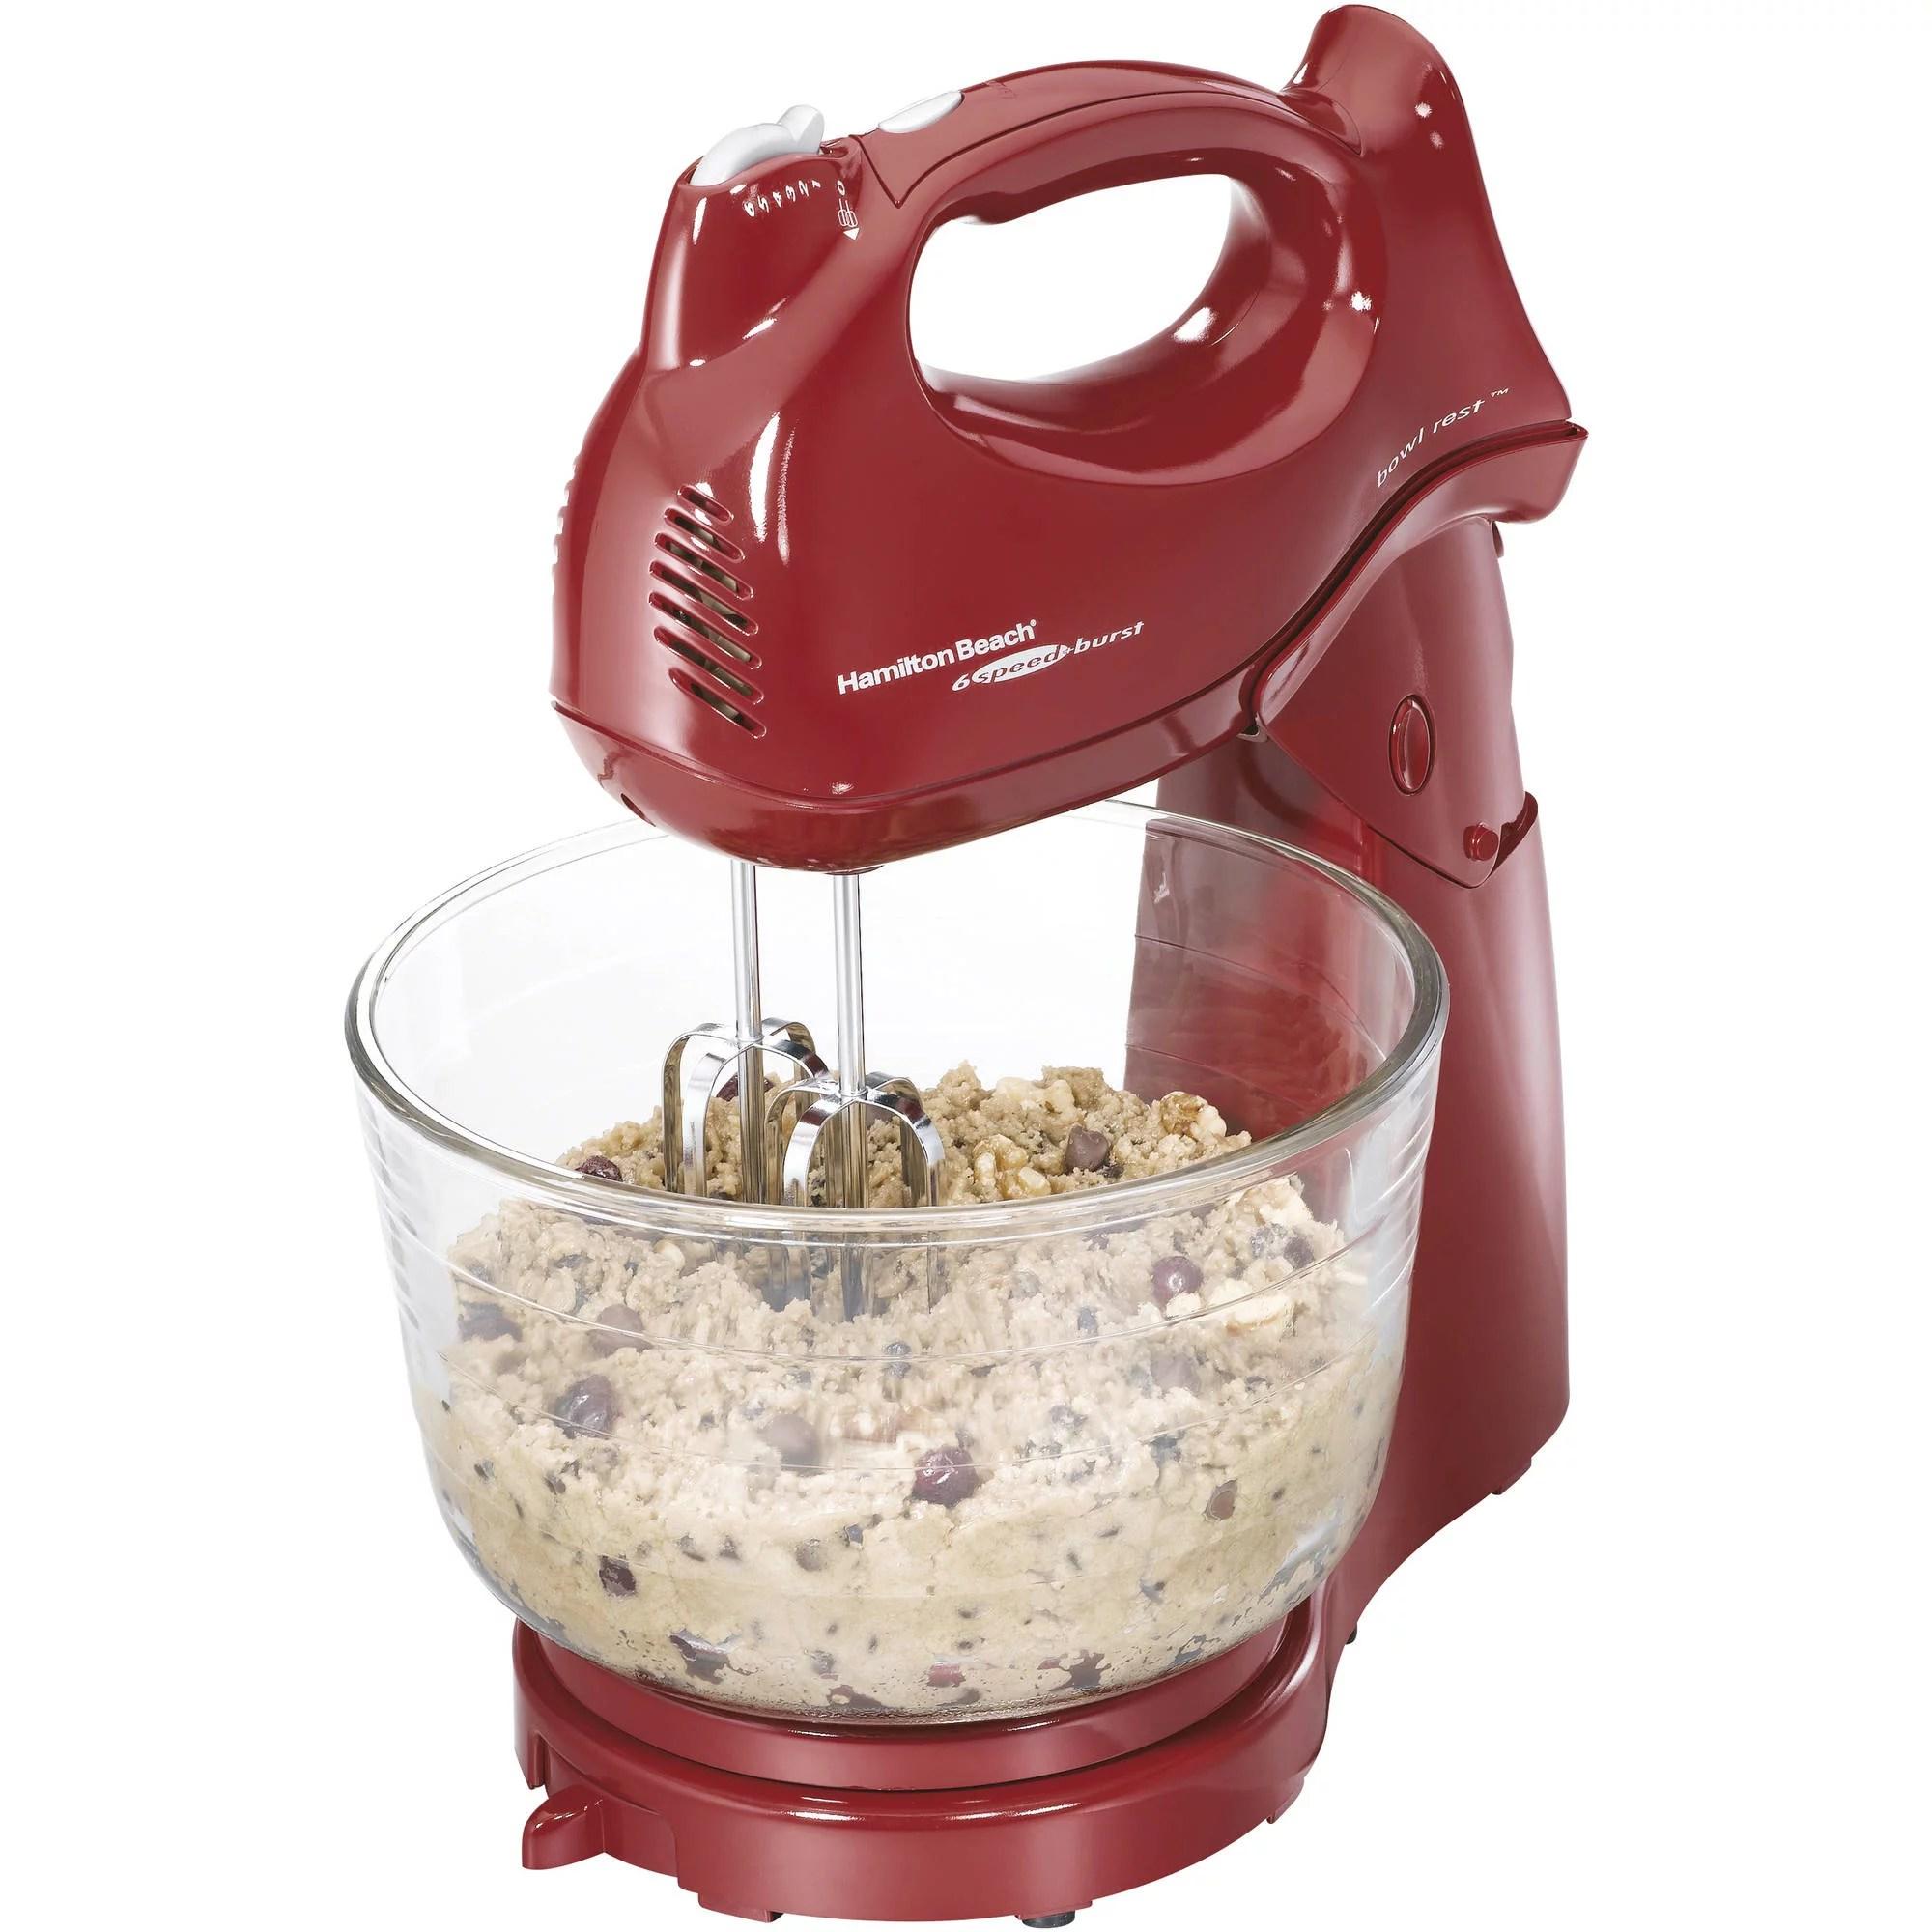 walmart kitchen aid mixer ikea sets hamilton beach power deluxe 4 quart stand red 64699 com